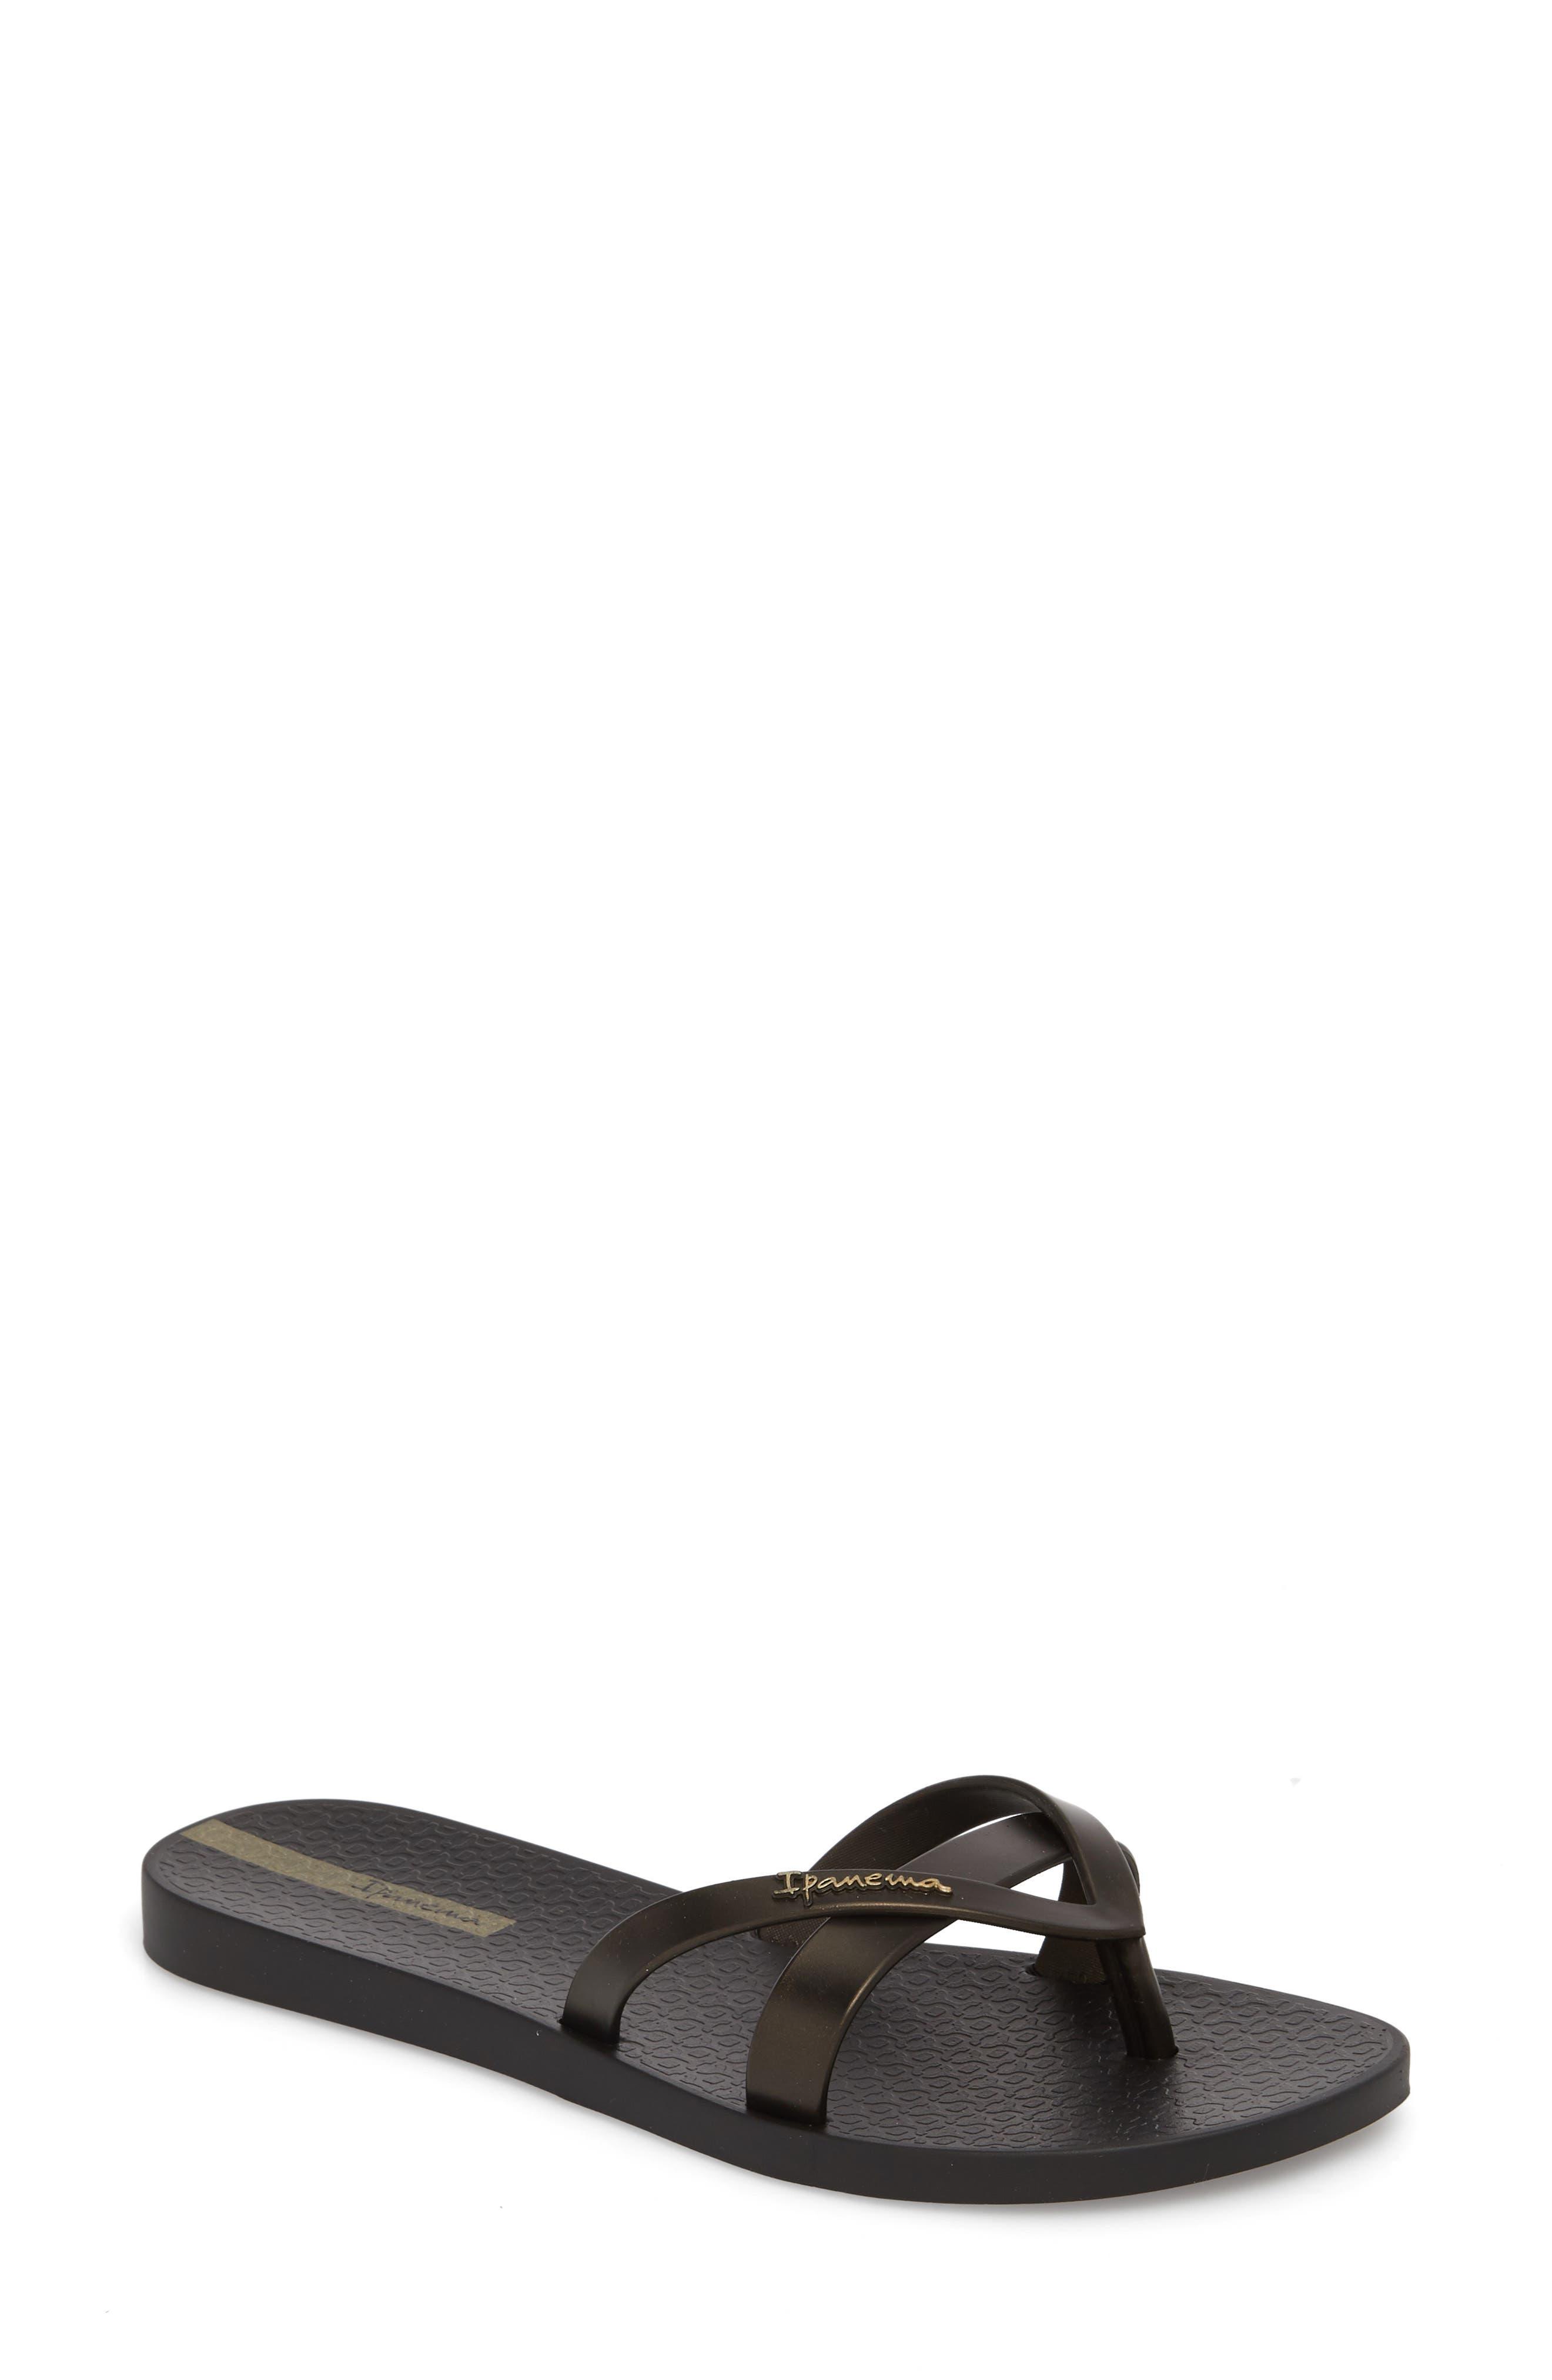 'Kirei Silk' Flip Flop,                         Main,                         color, 013